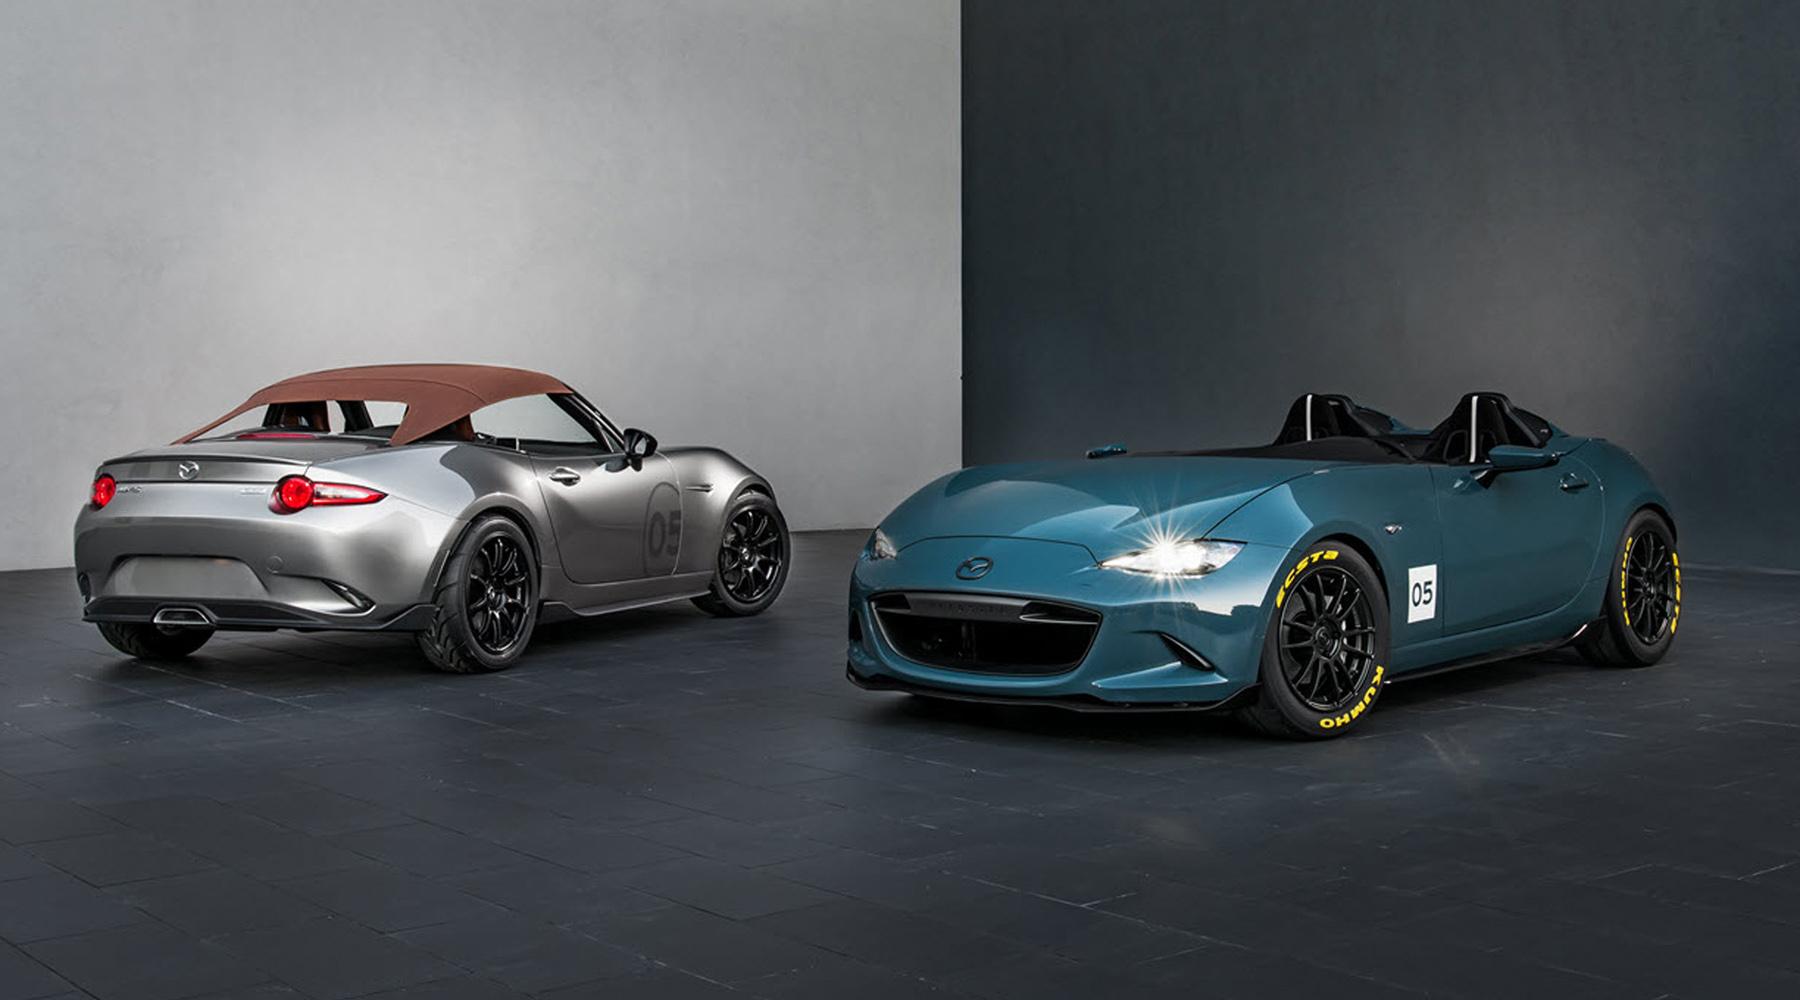 Mazda MX-5 Spyder and MX-5 Speedster